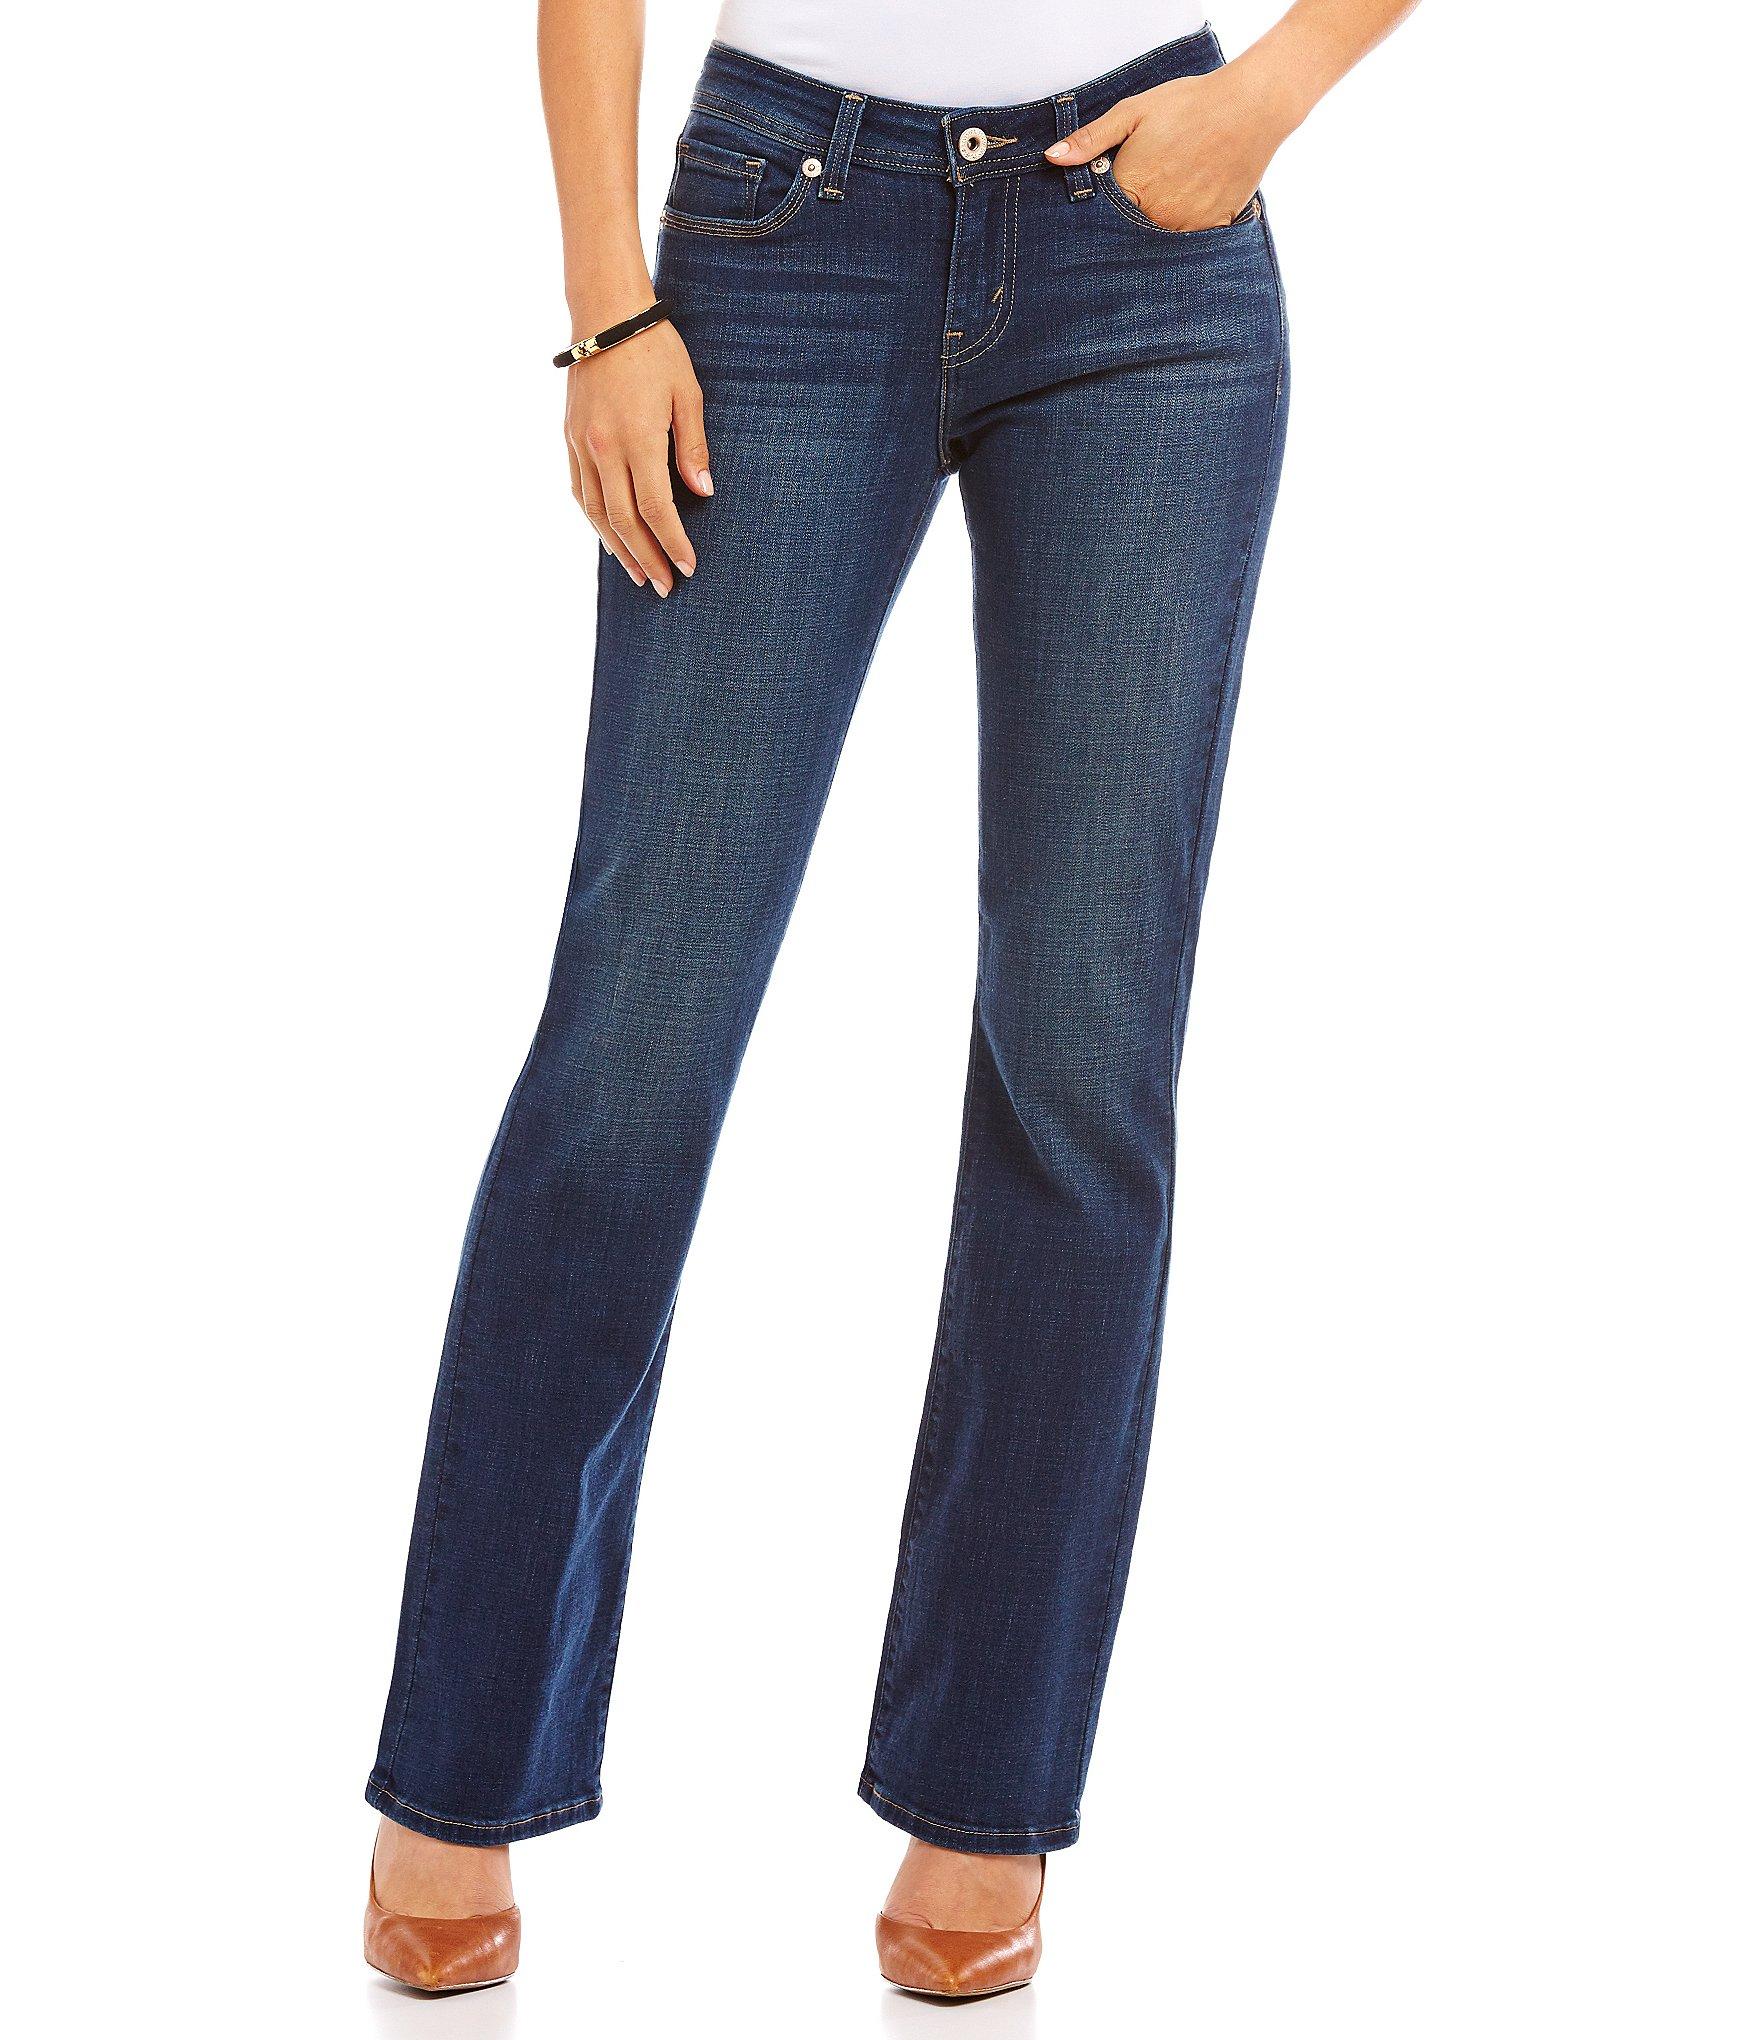 levi s 529 curvy bootcut jeans dillards. Black Bedroom Furniture Sets. Home Design Ideas